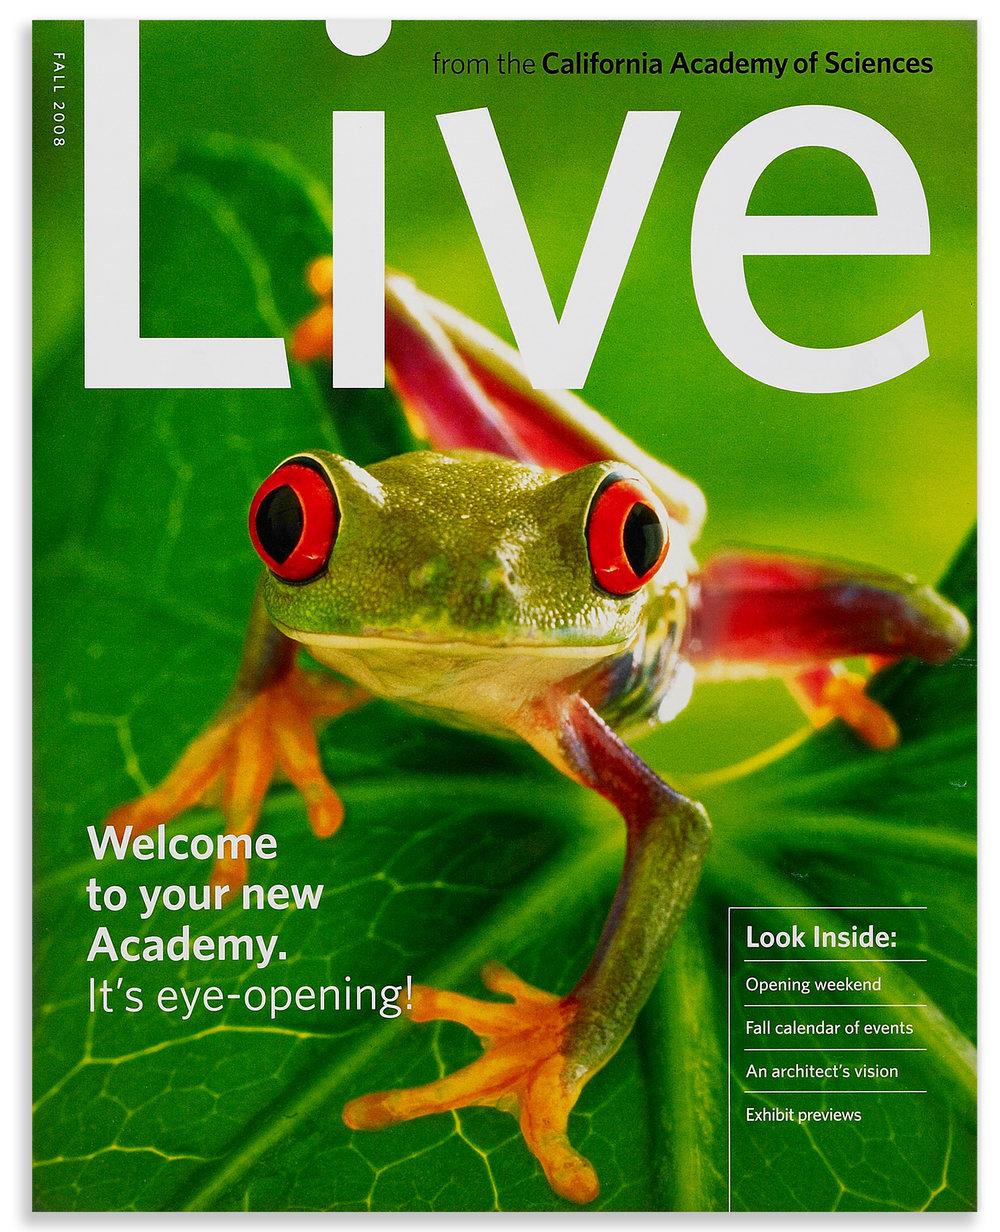 Live, California Academy of Sciences